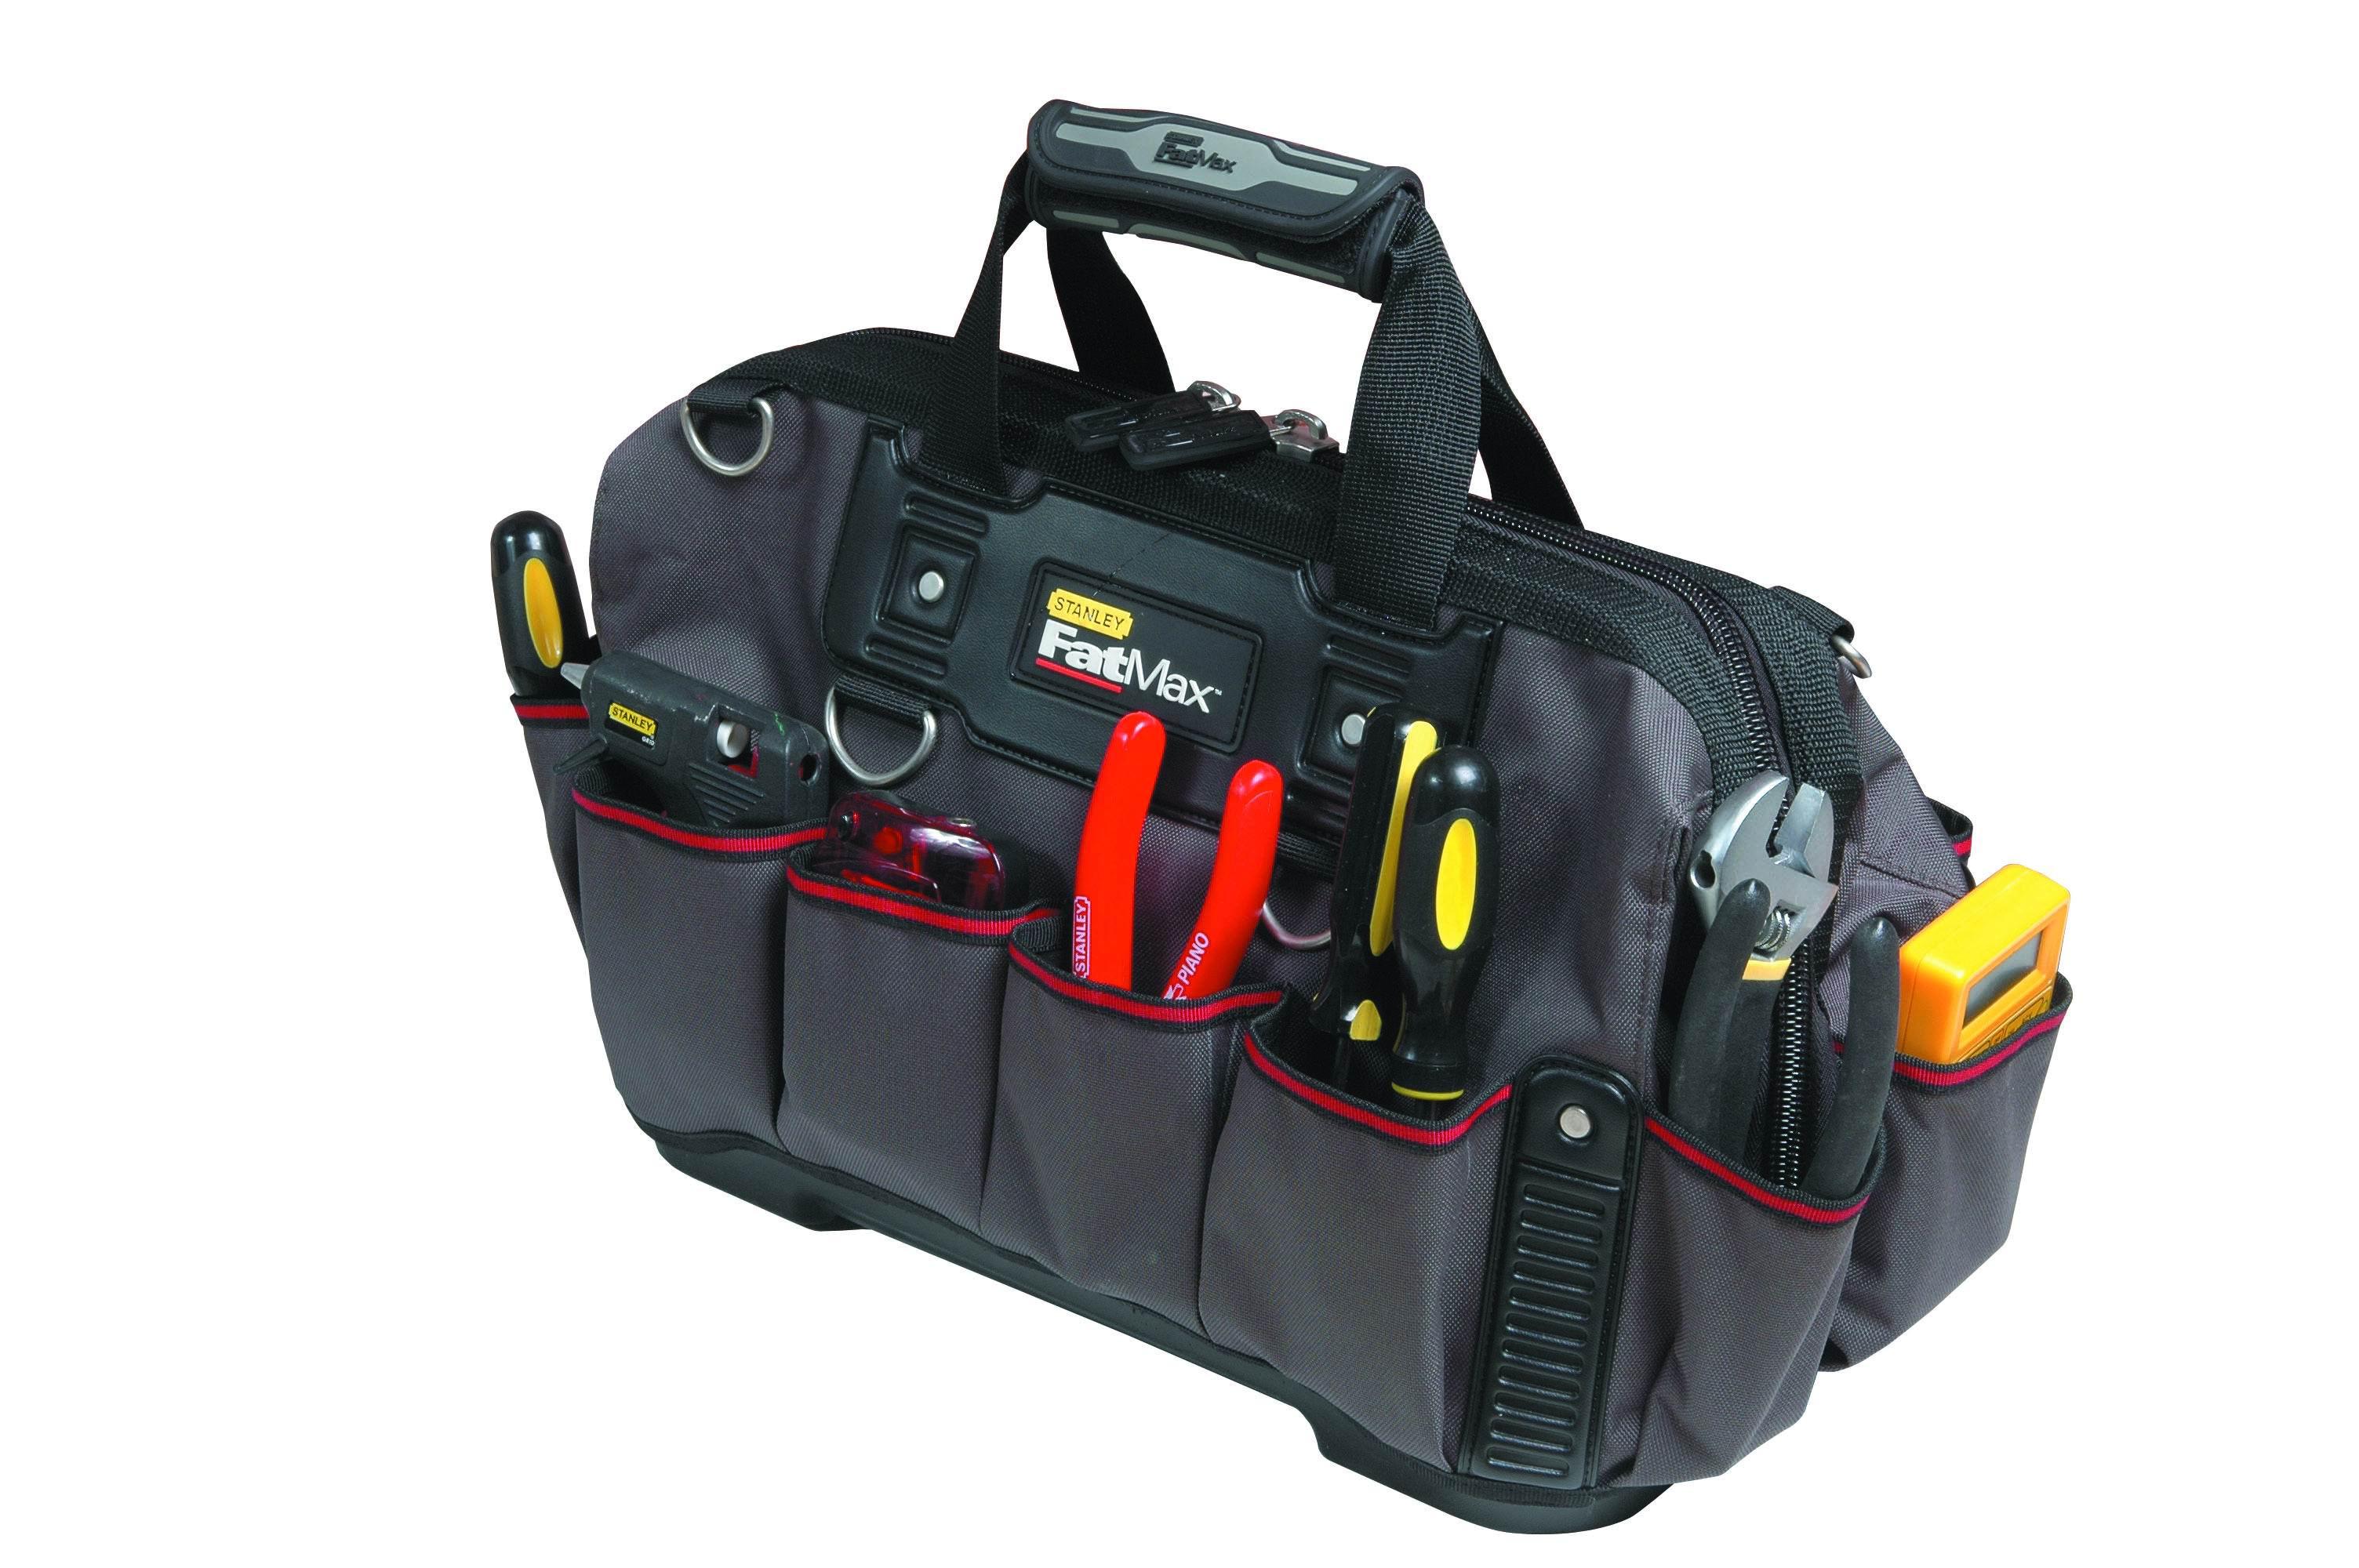 Sac porte outils souple 490 x 260 x 100 mm